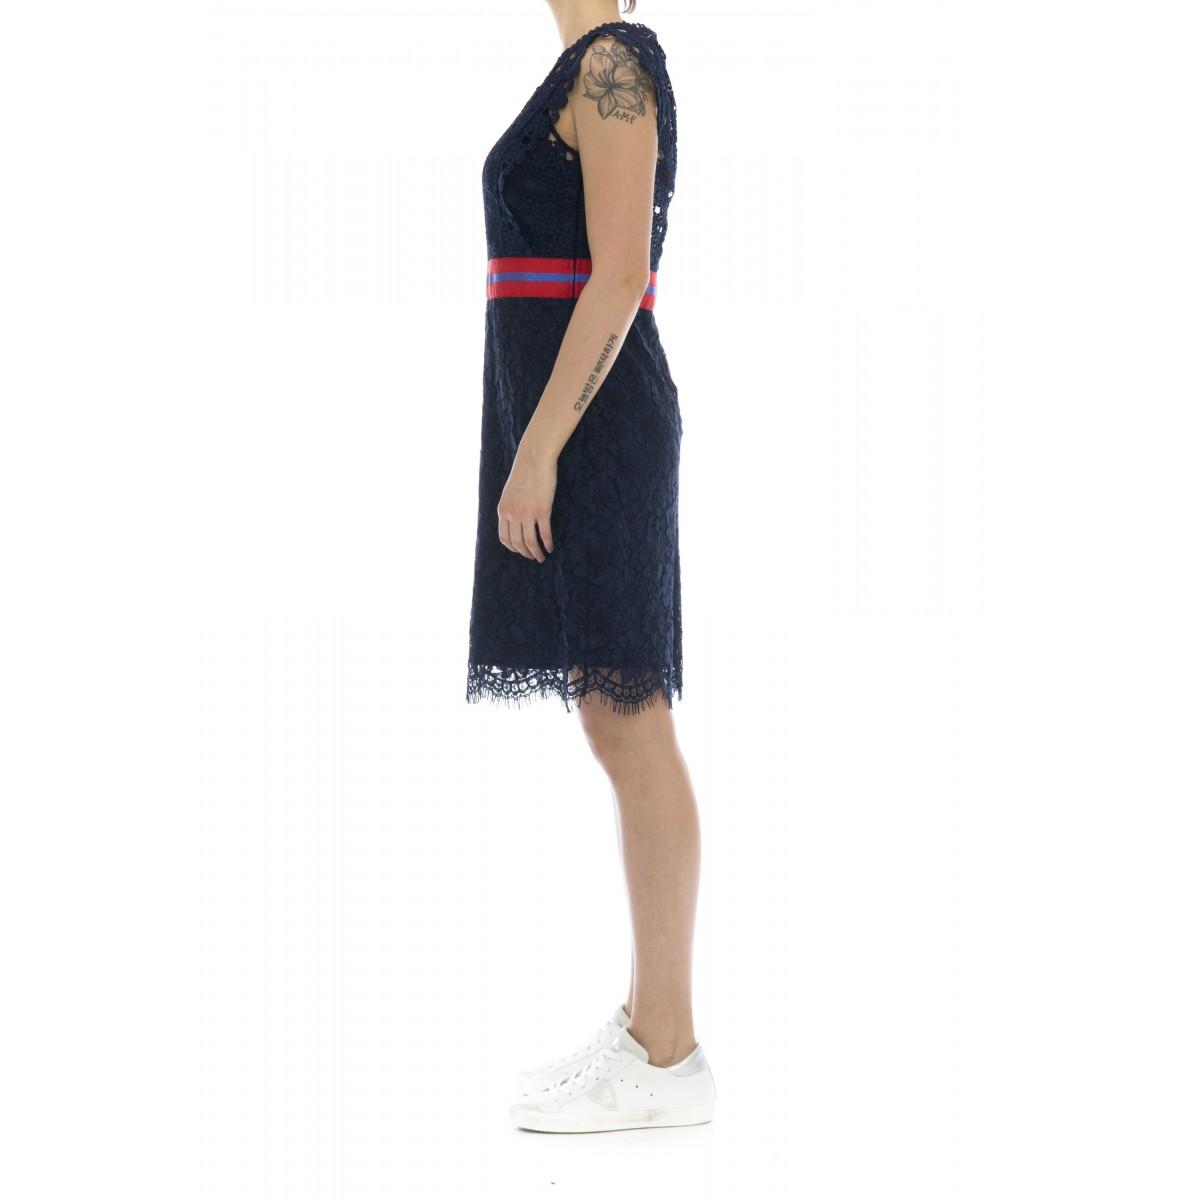 Vestito - Vand vestito pizzo